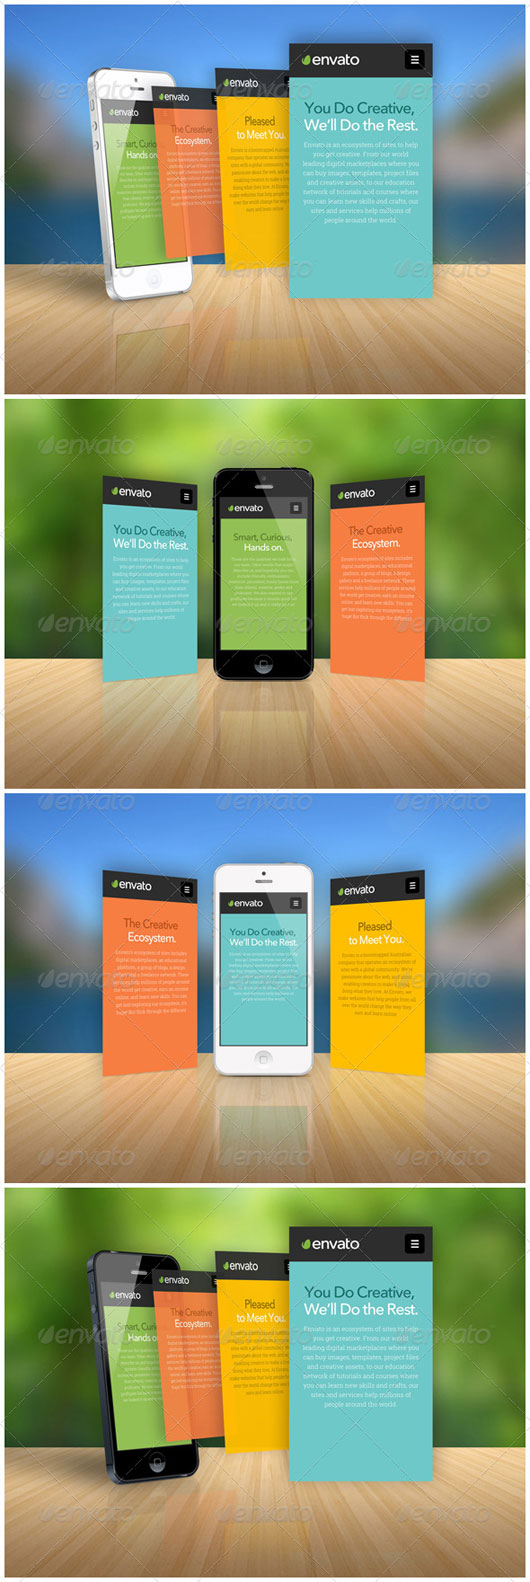 Mobile App Mockups